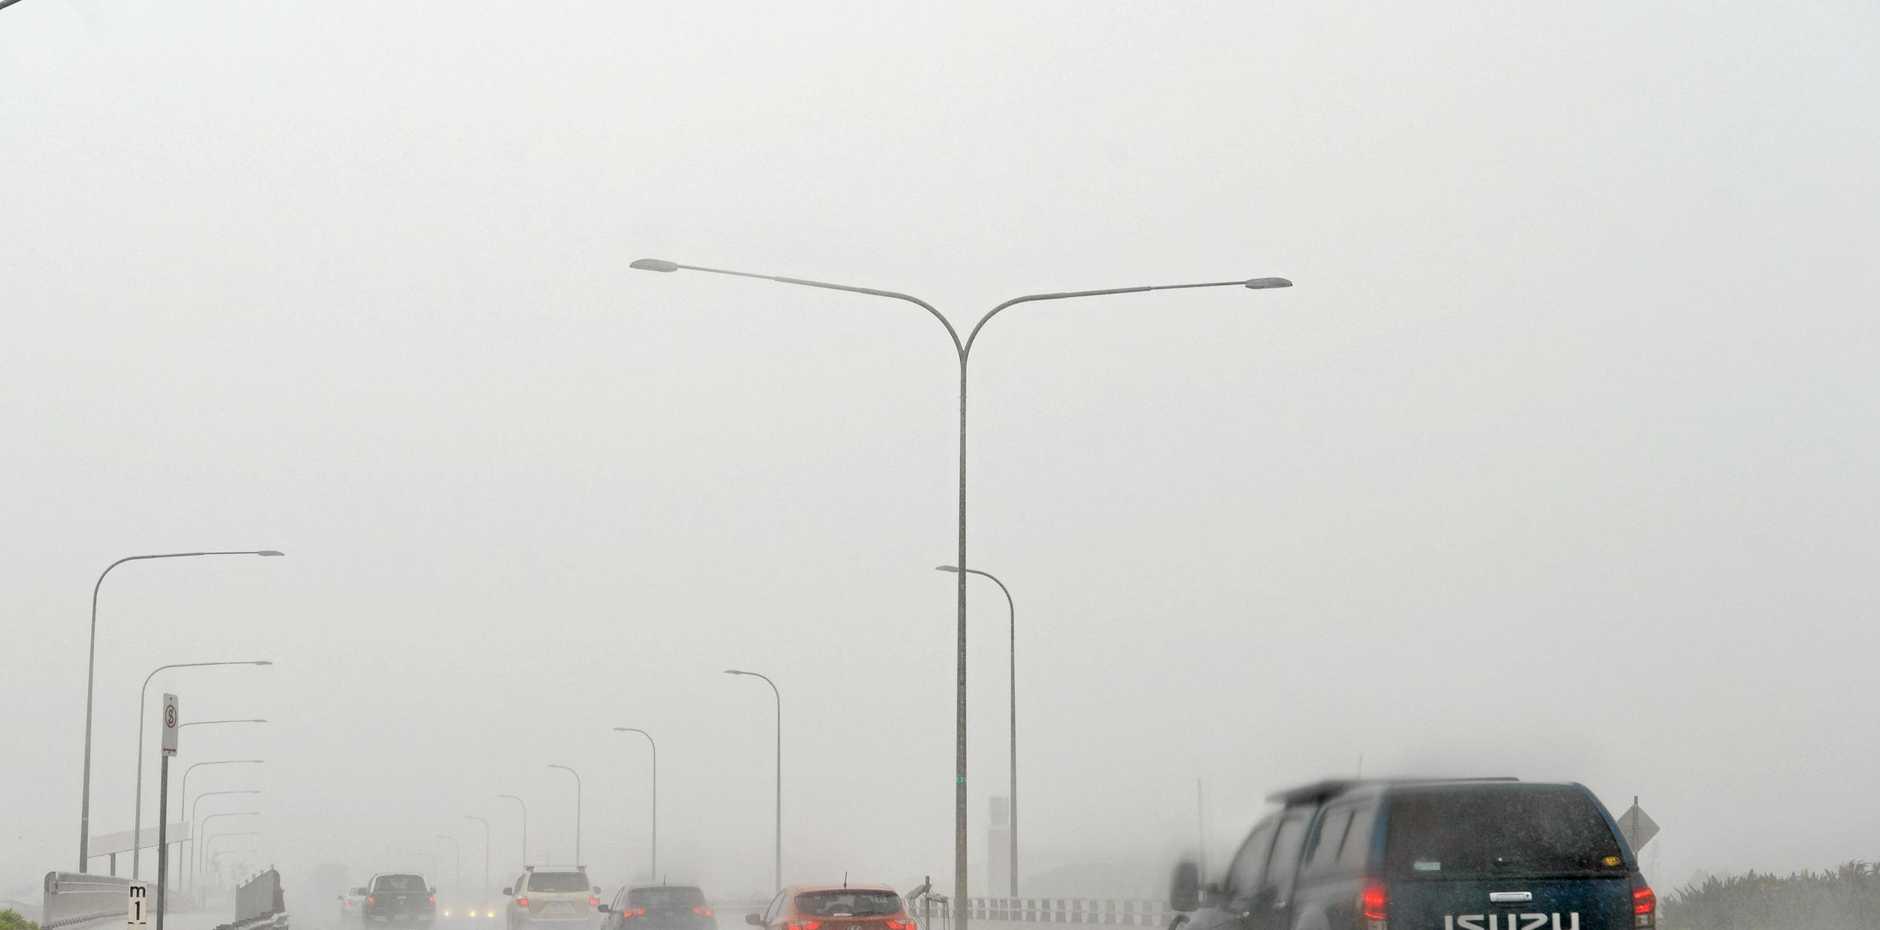 Traffic weather around Mackay. Rain on Forgan Smith Bridge.